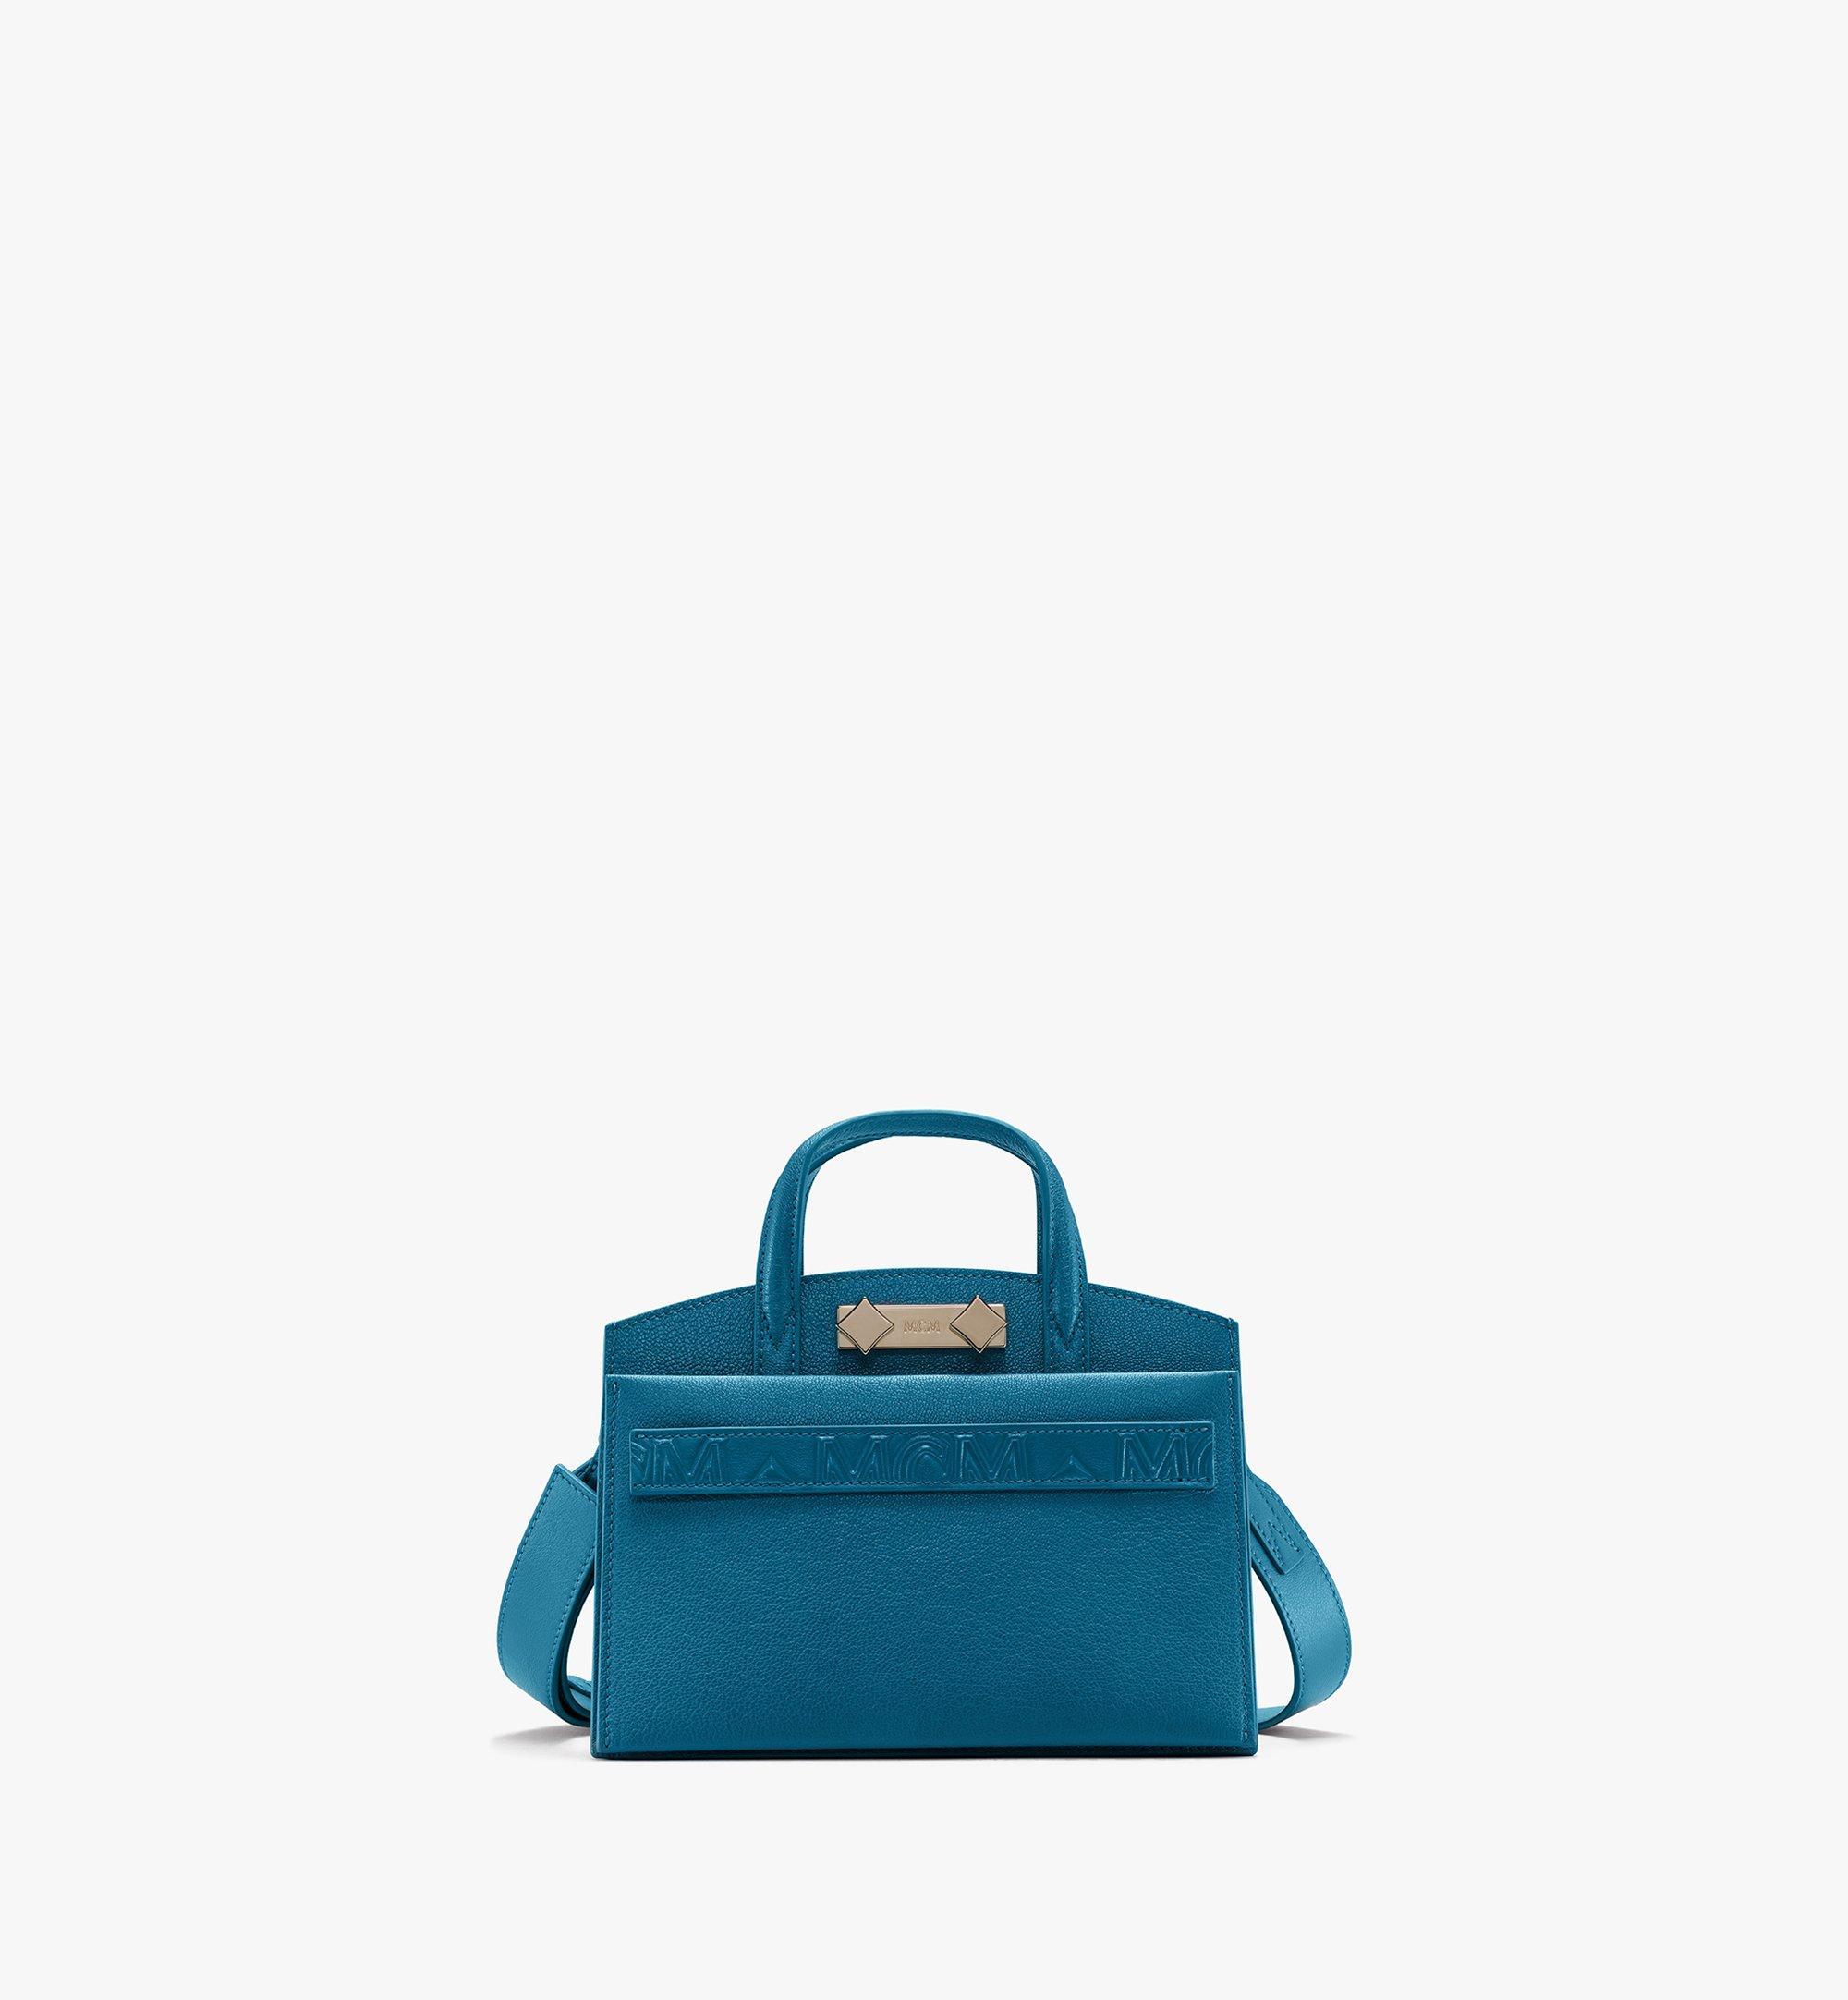 MCM Milano Tote Bag in Goatskin Leather Blue MWTASDA04JF001 Alternate View 1